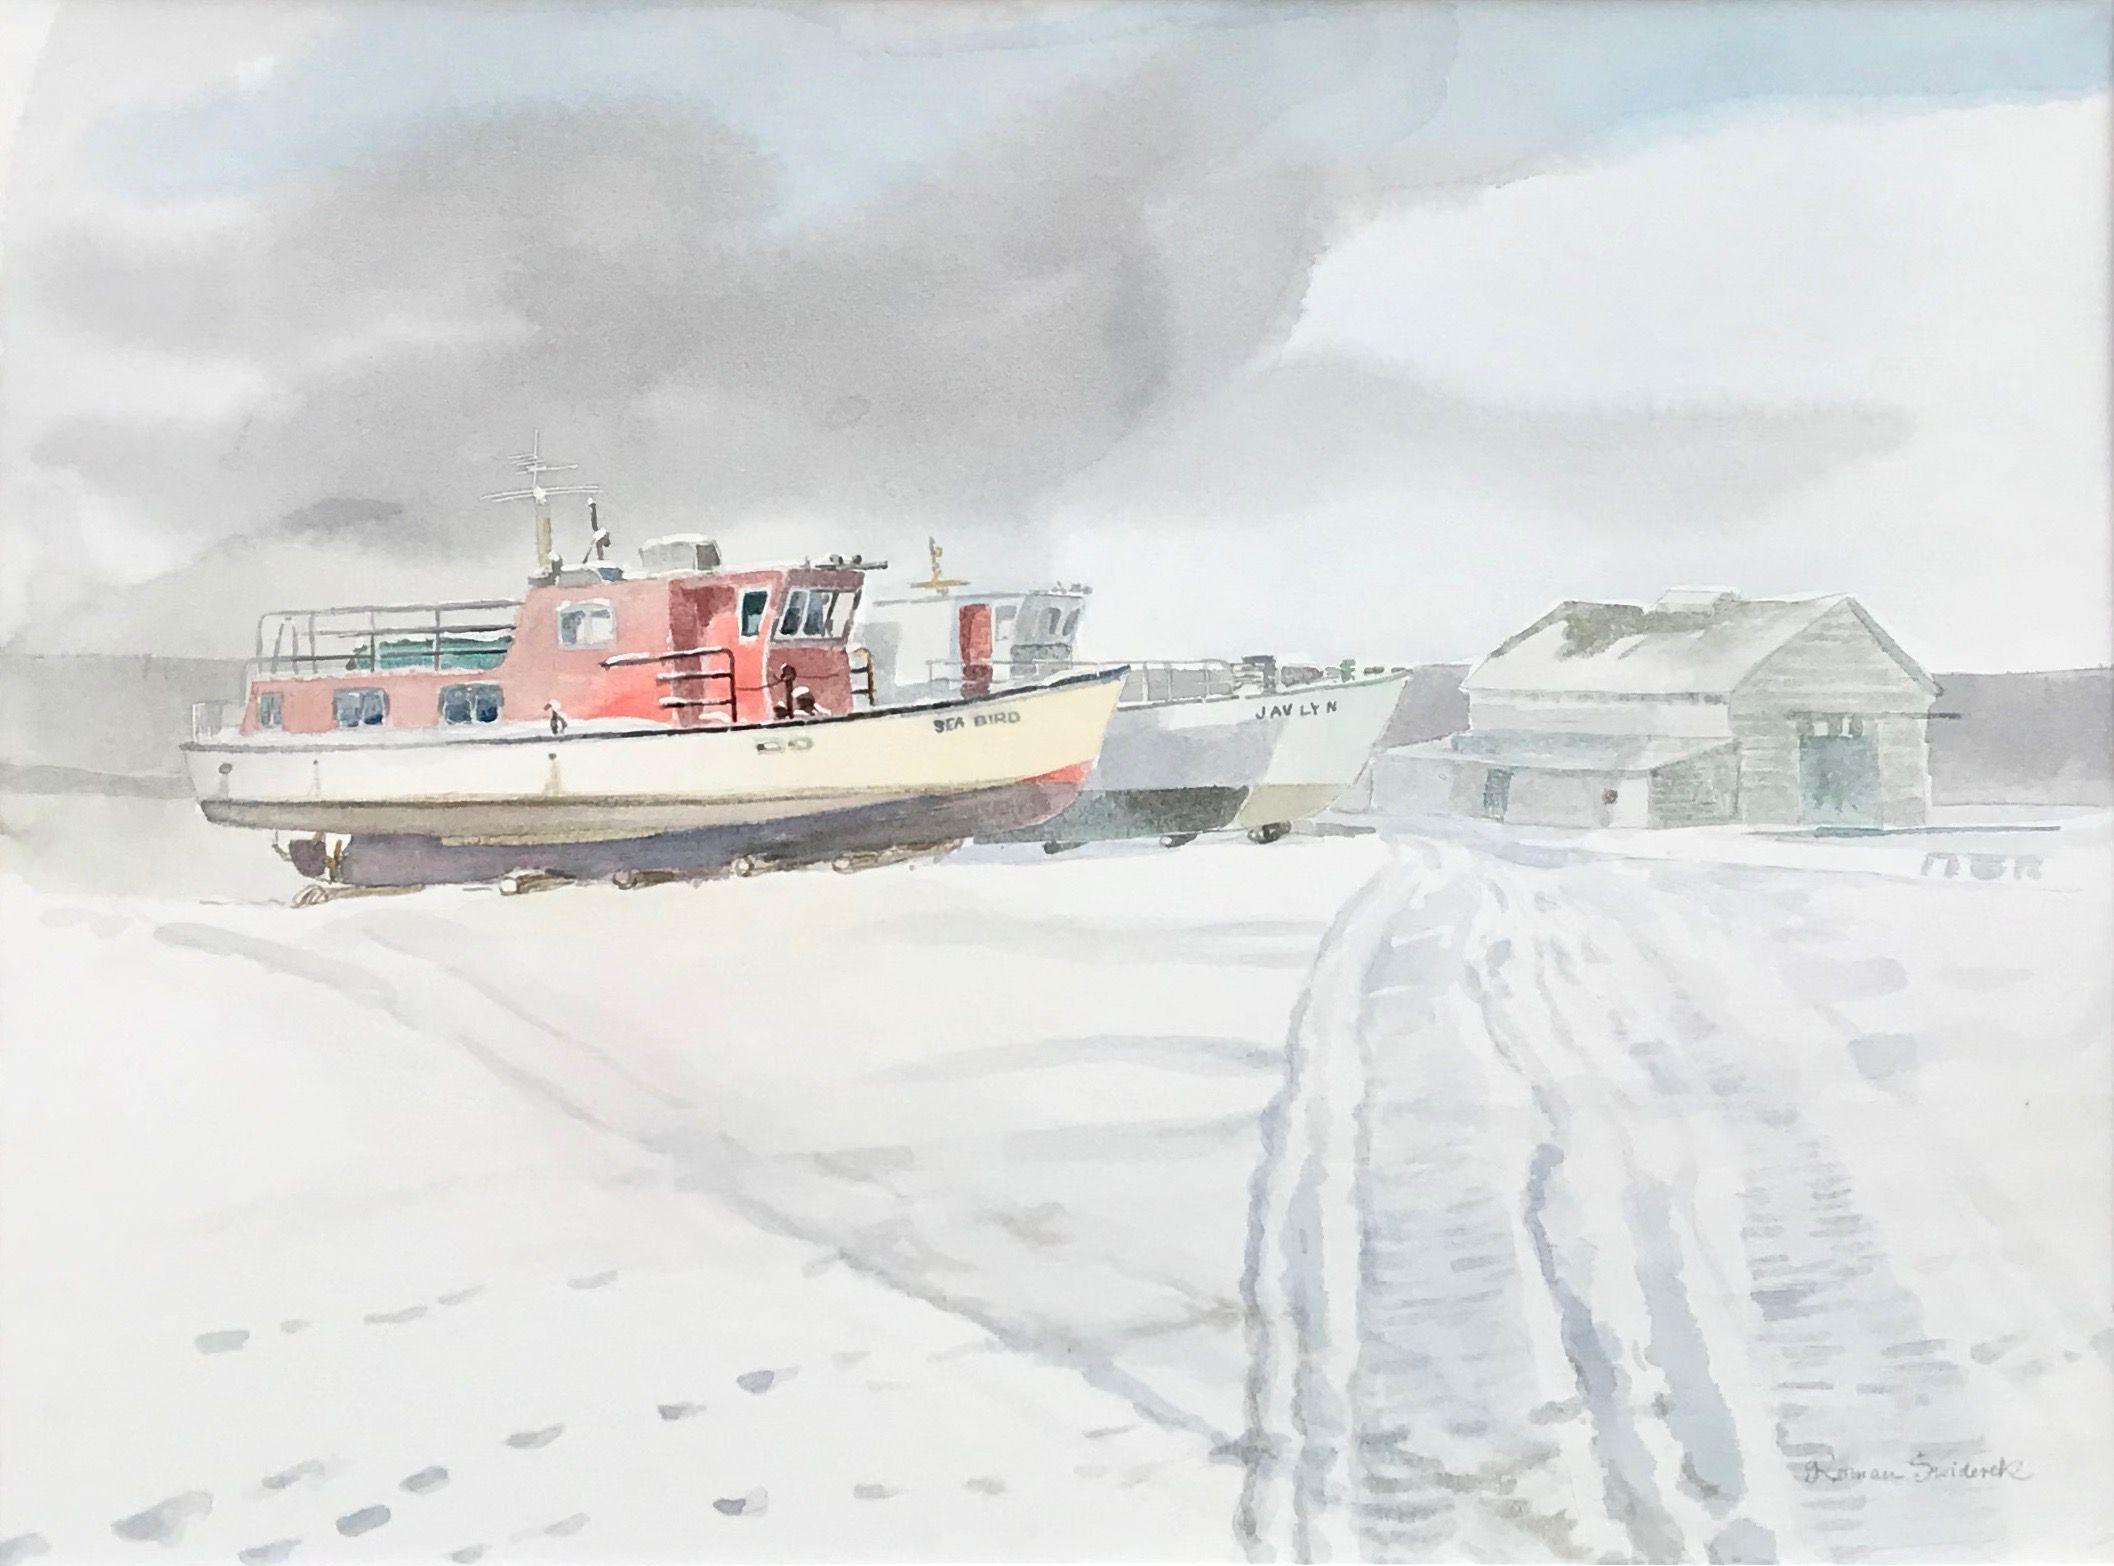 Still Winter (Hecla Island Village Icehouse & Wharf)